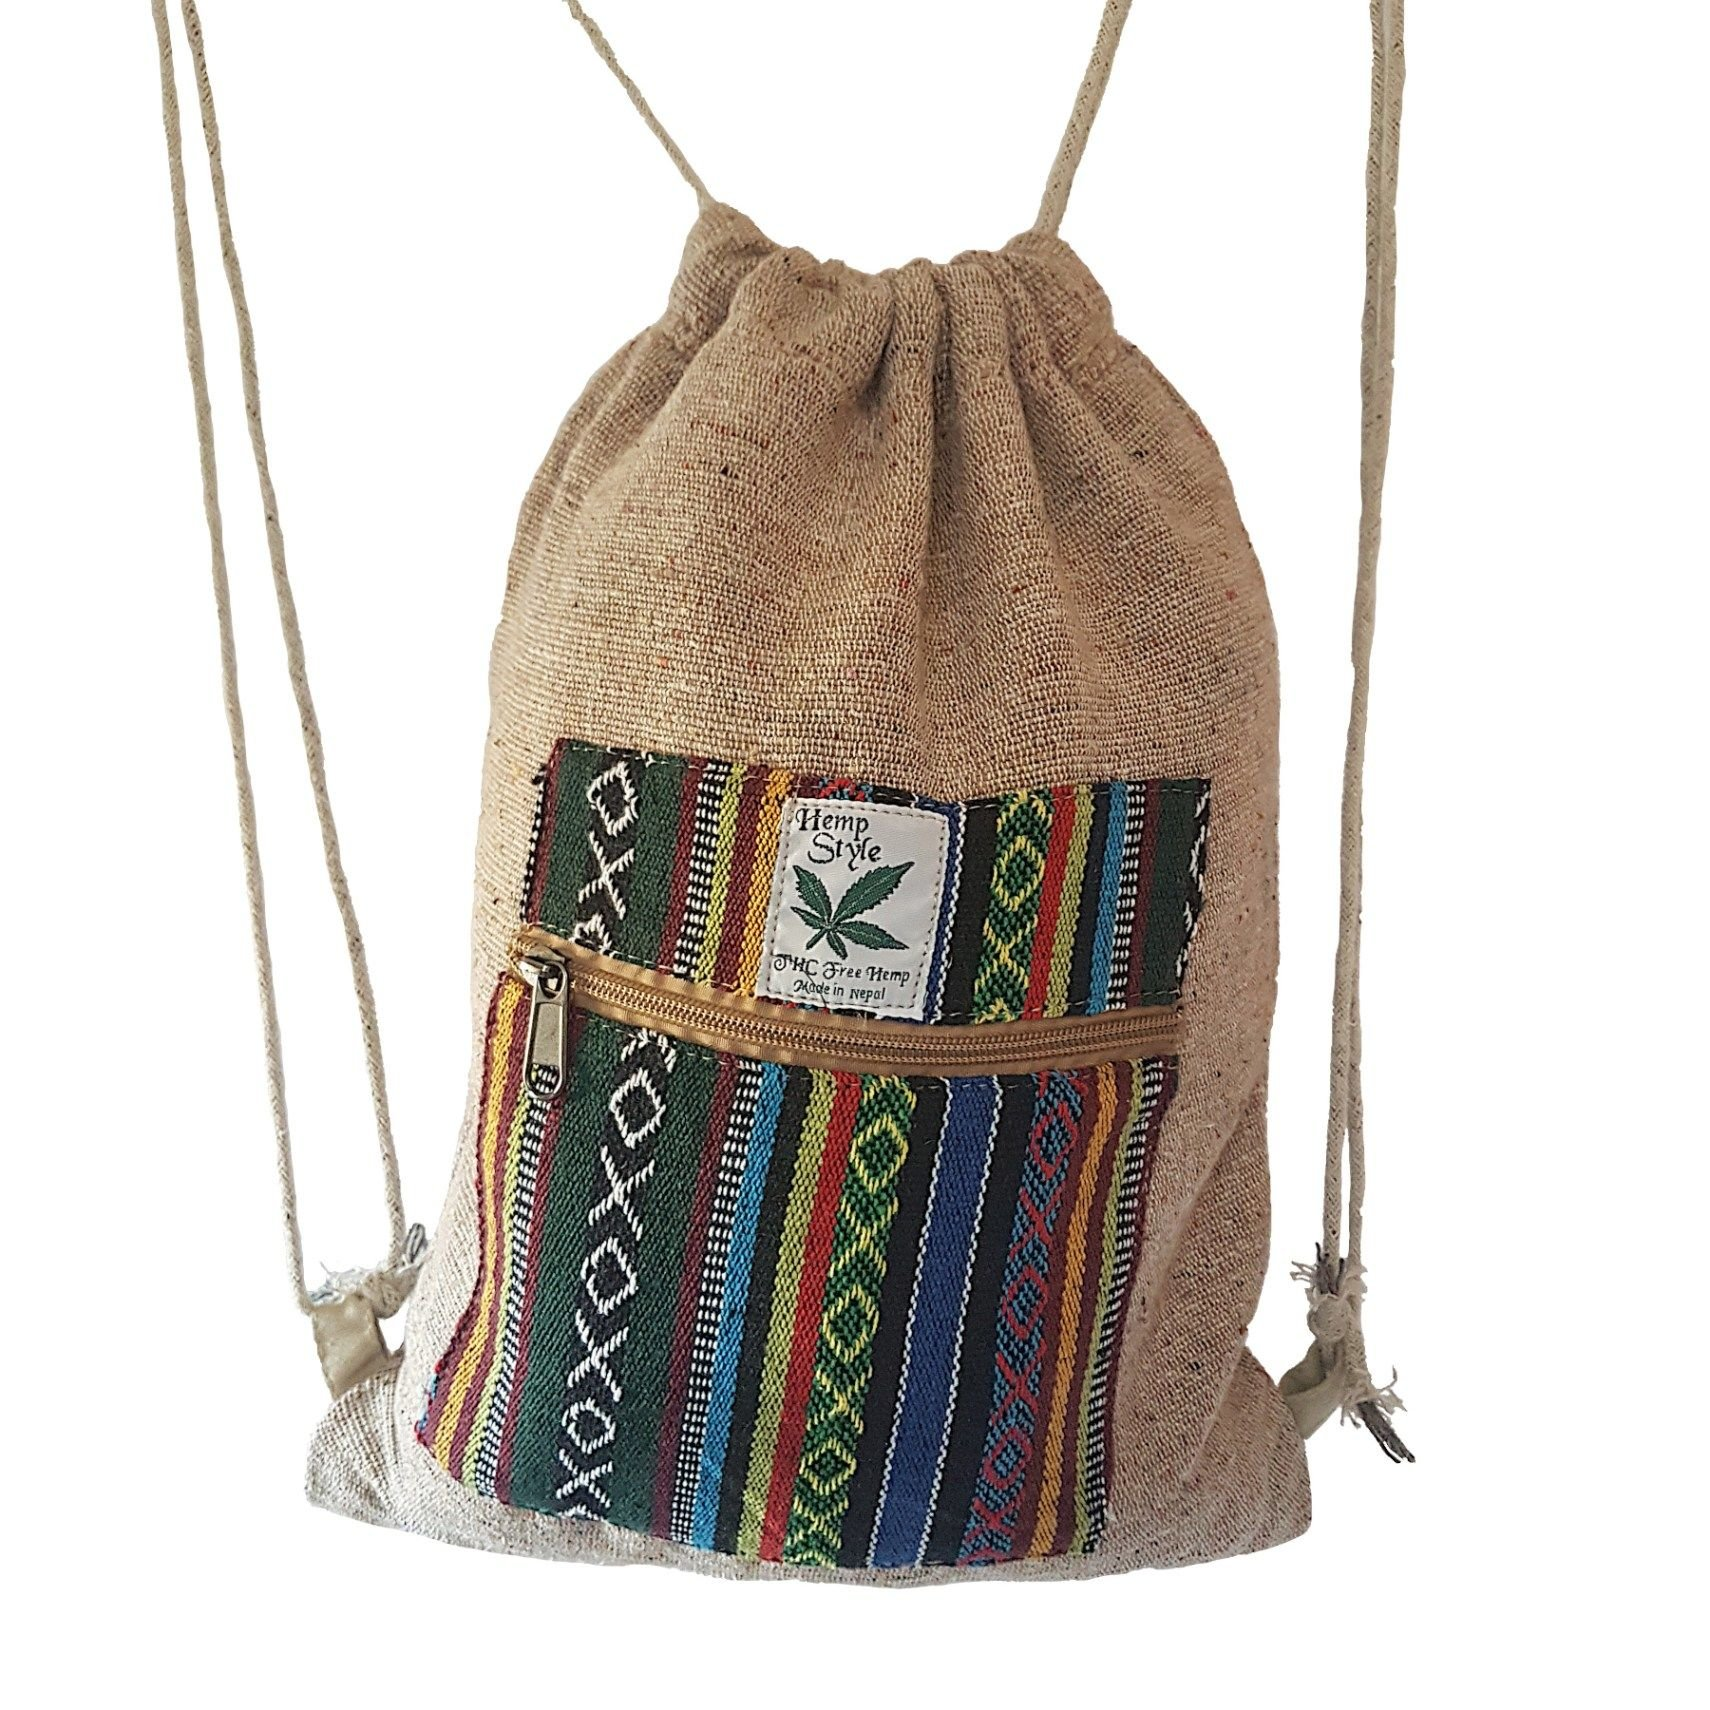 Hemp one style draw string bag